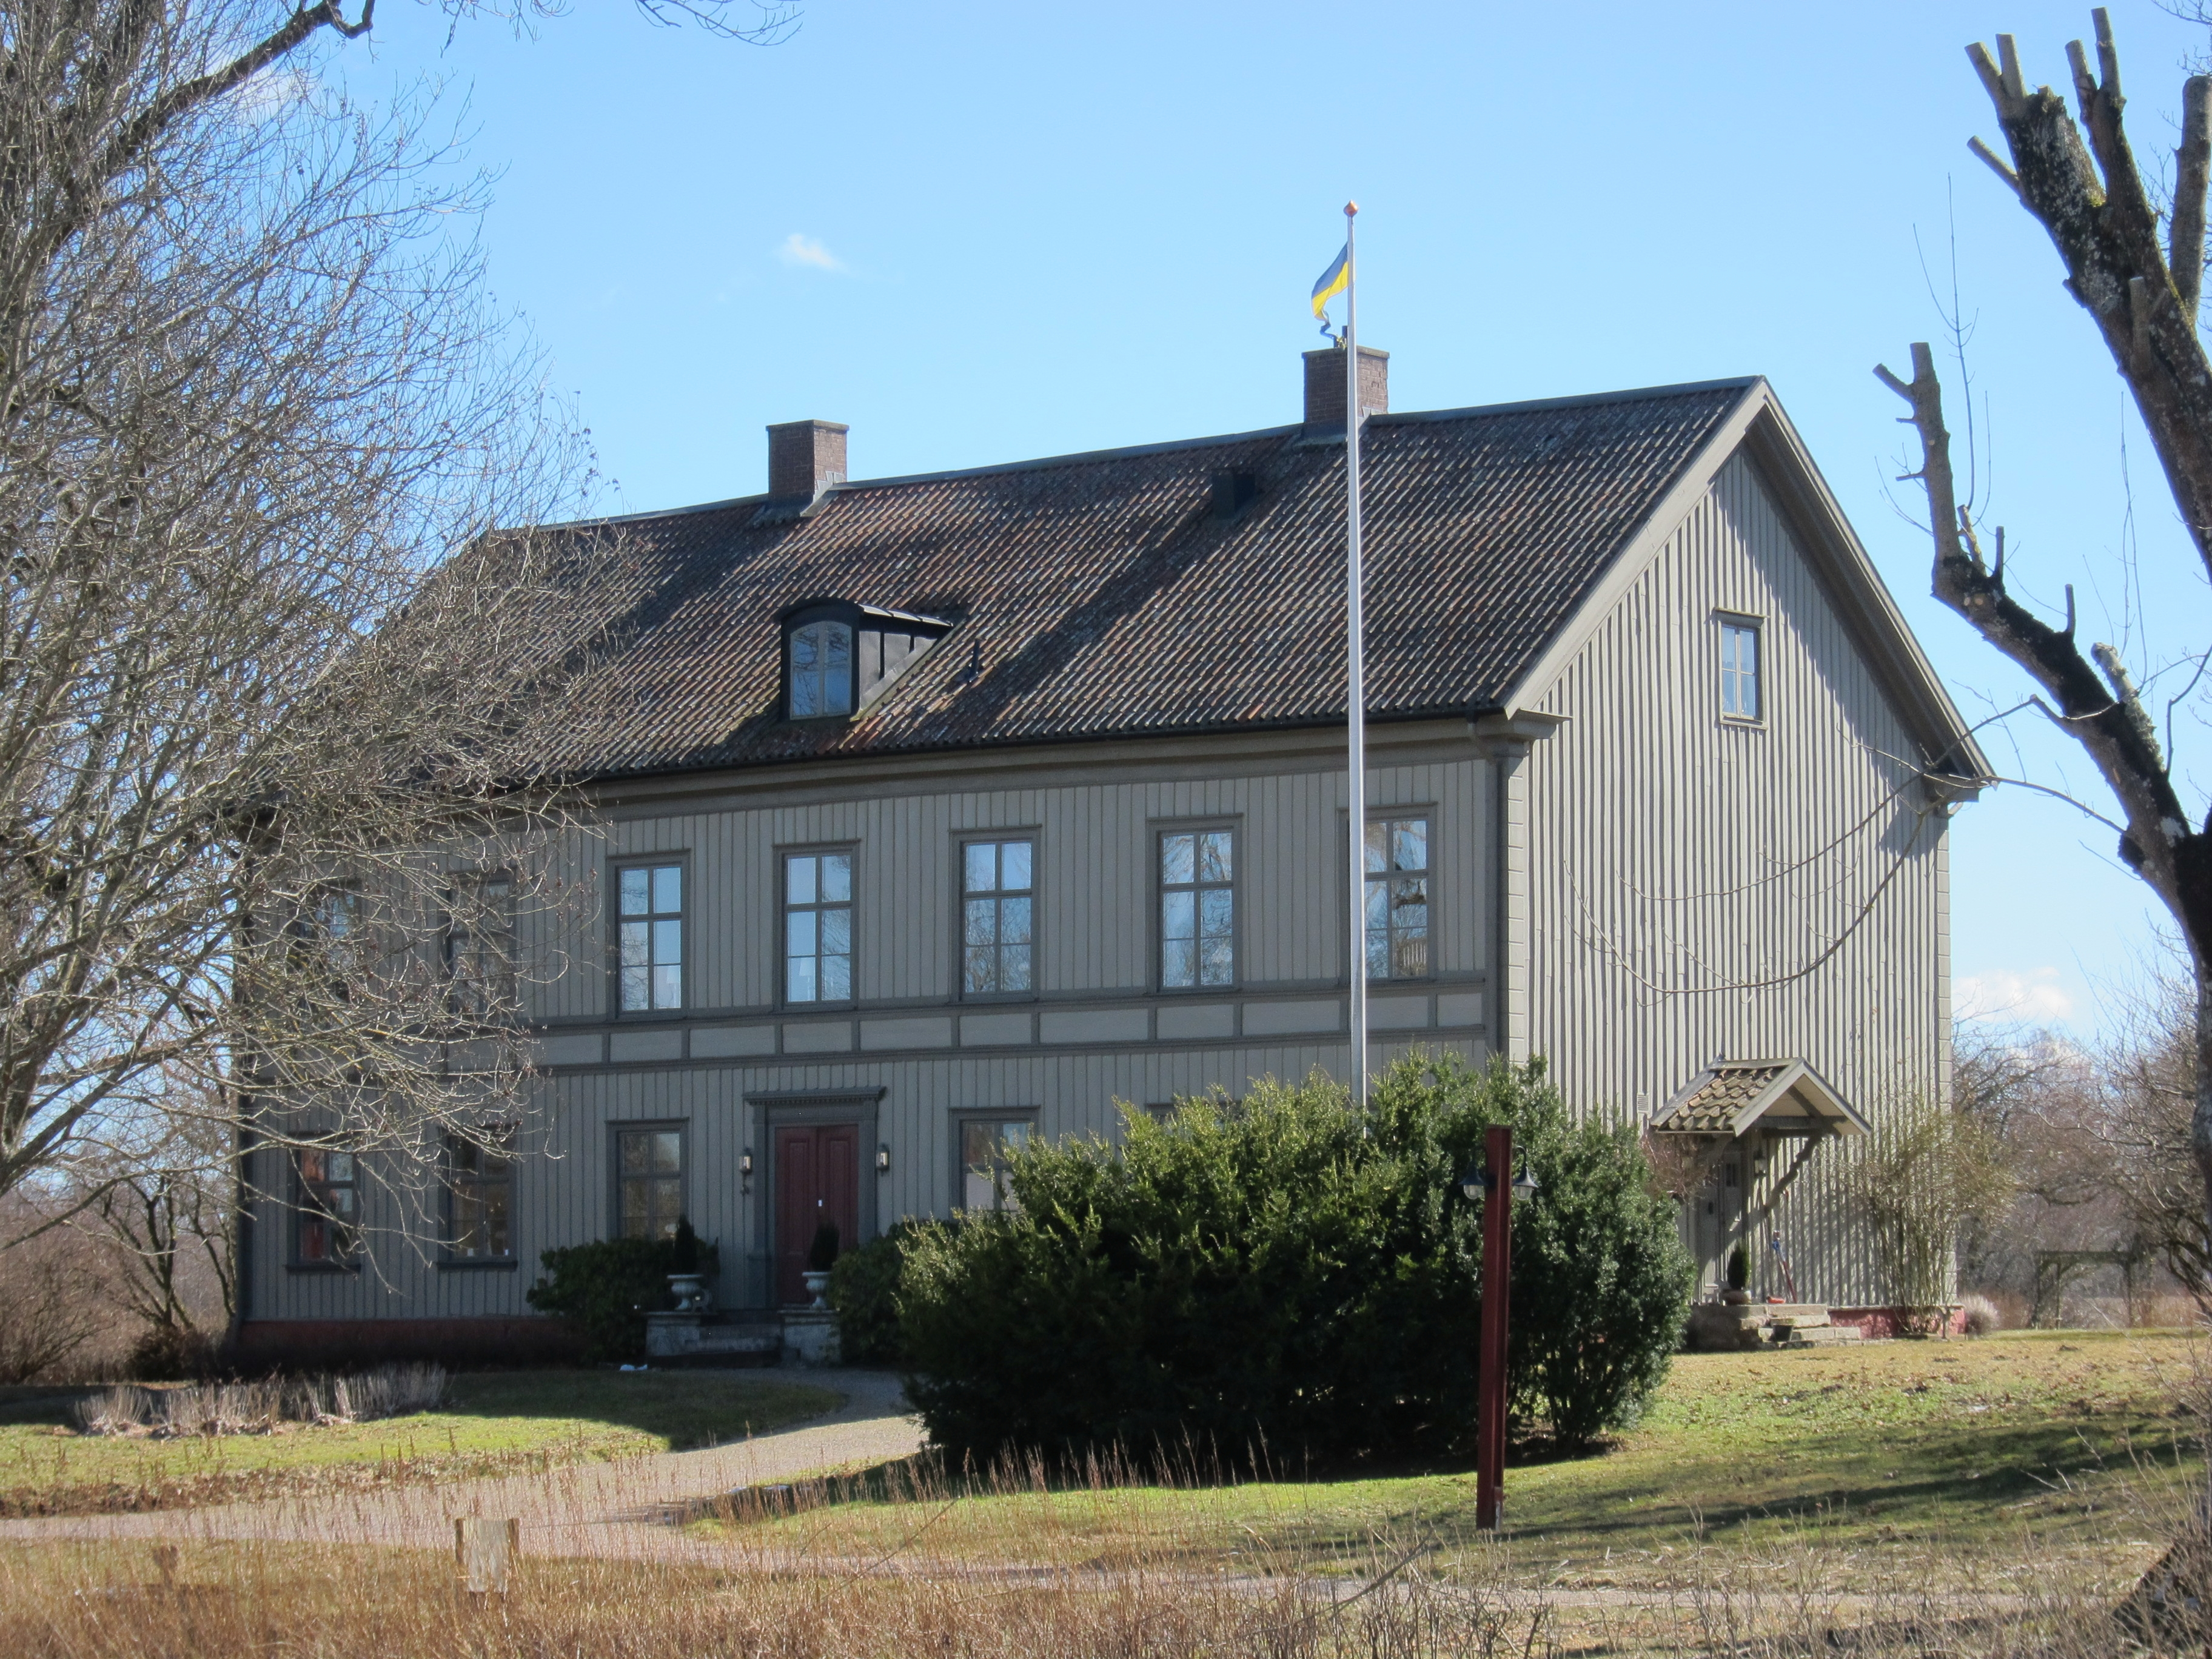 Granbäcks gård